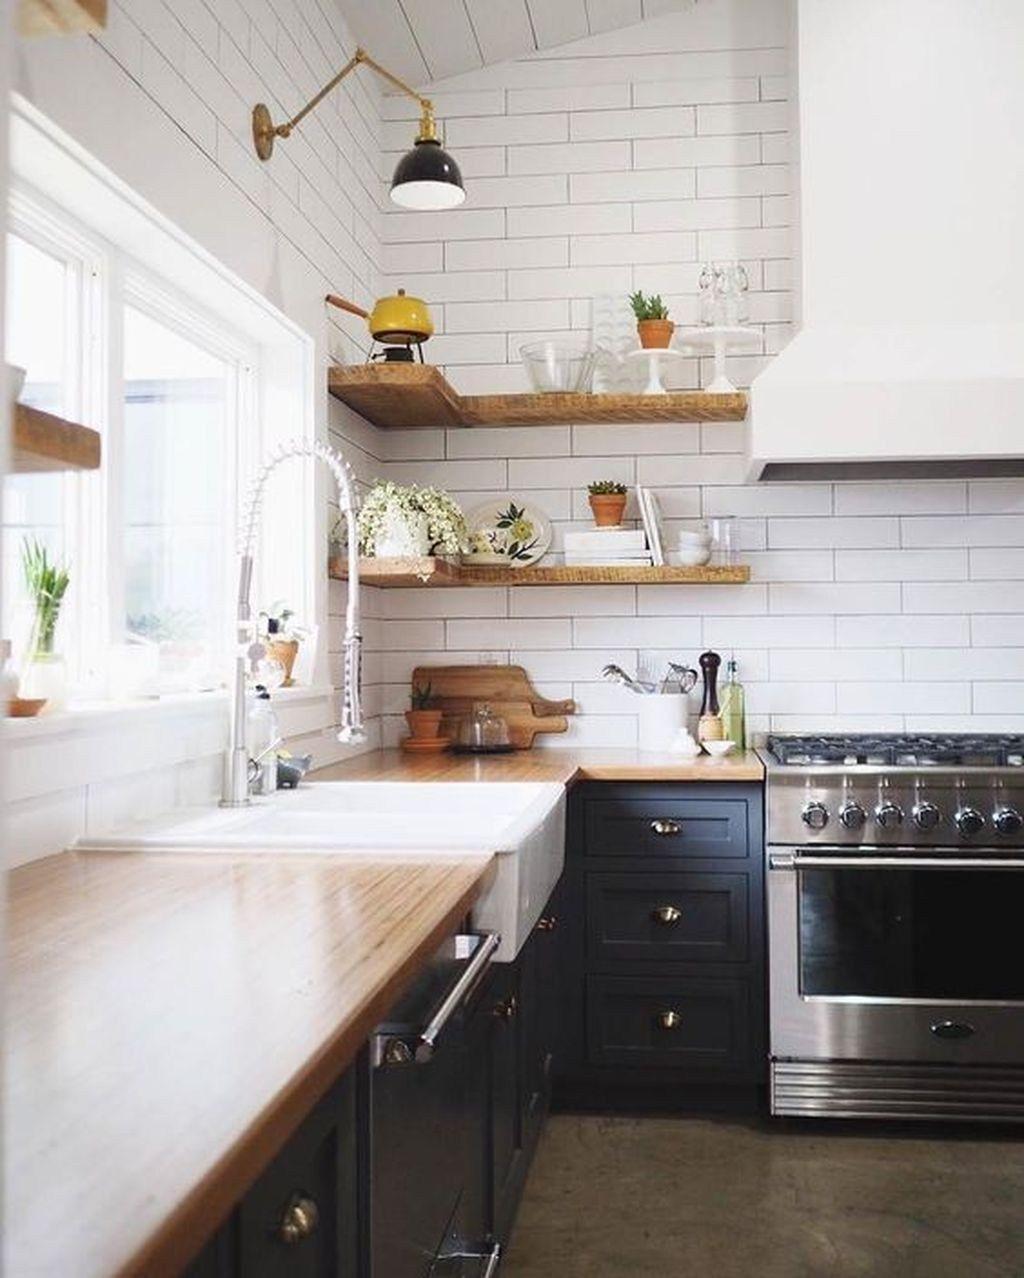 36 Stunning Farmhouse Country Kitchen Design Ideas